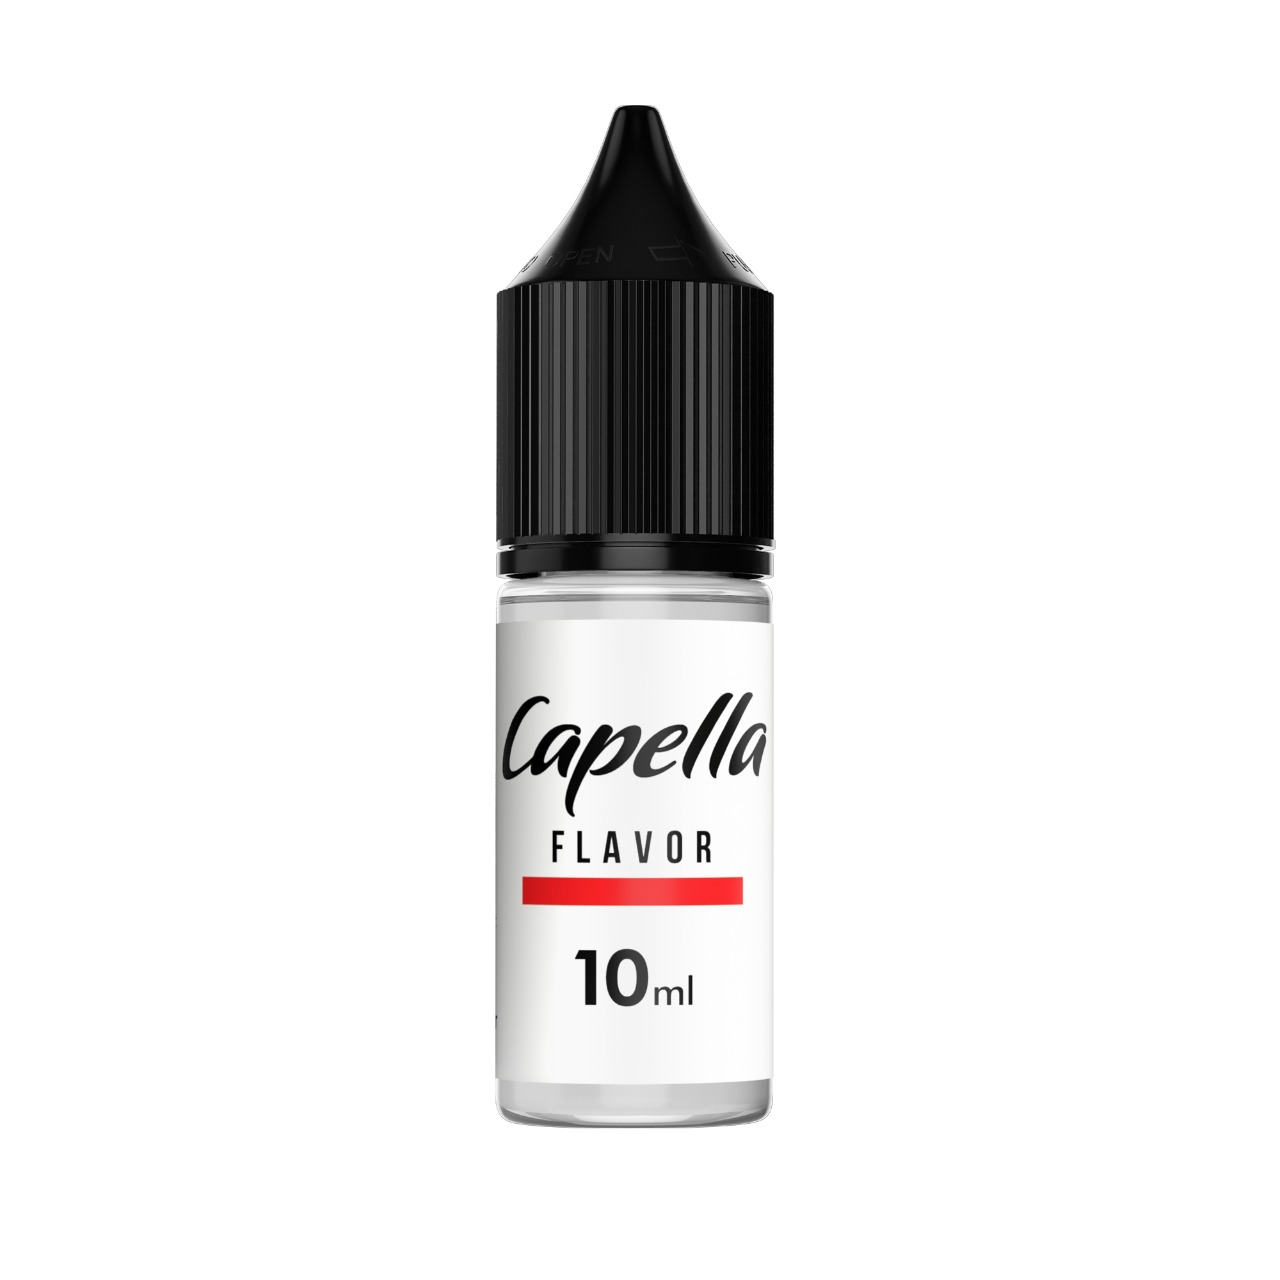 Capella (CAP) Capella (CAP) Ripe Strawberries 10ml